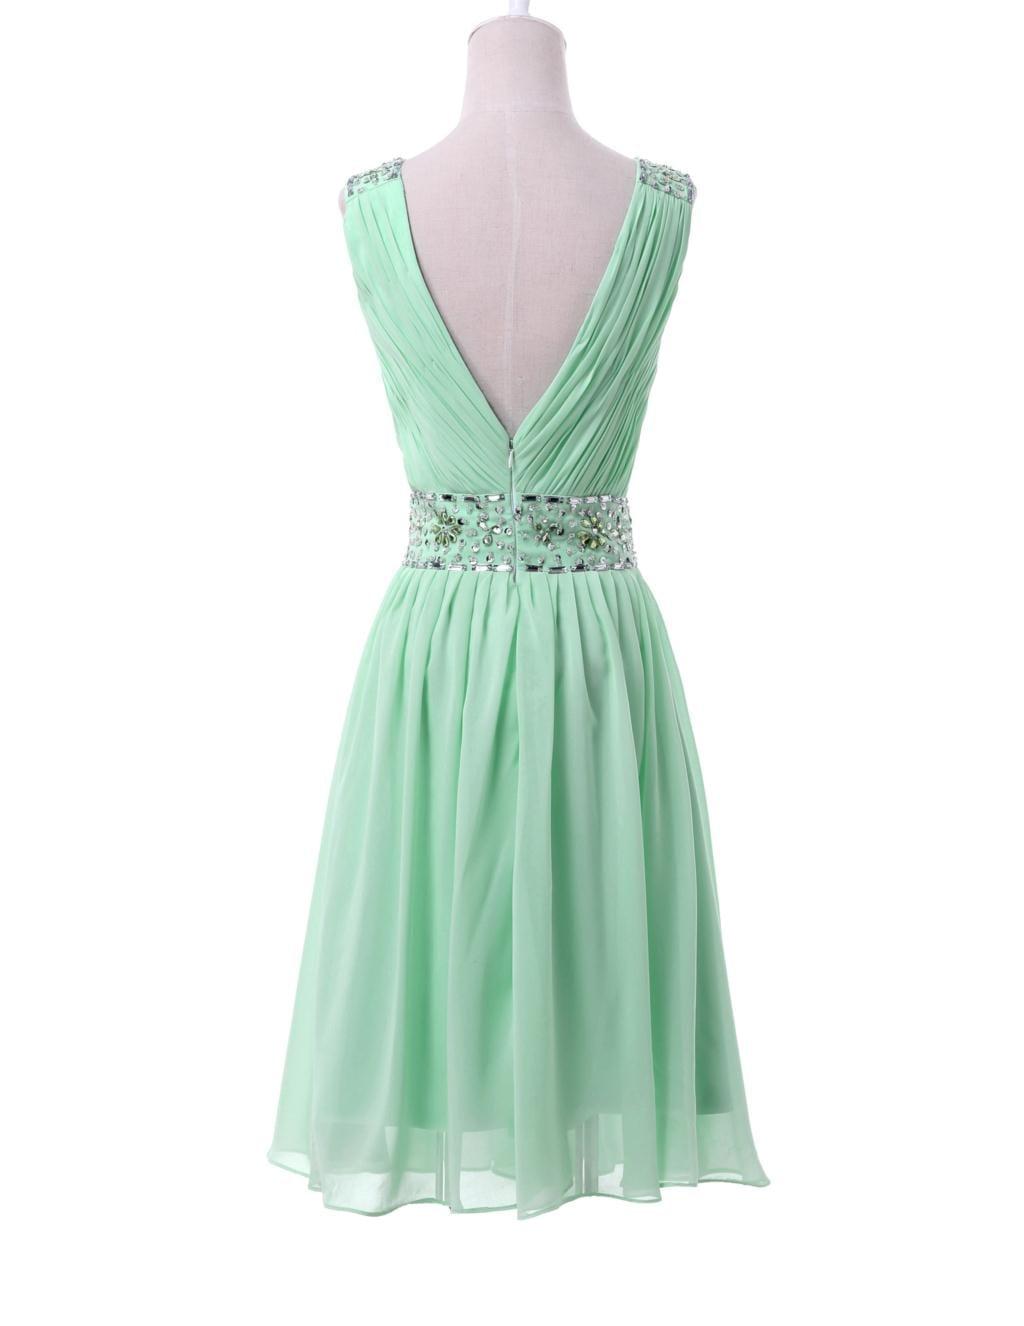 Mint Green Short Chiffon Sequin Bridesmaid Dress